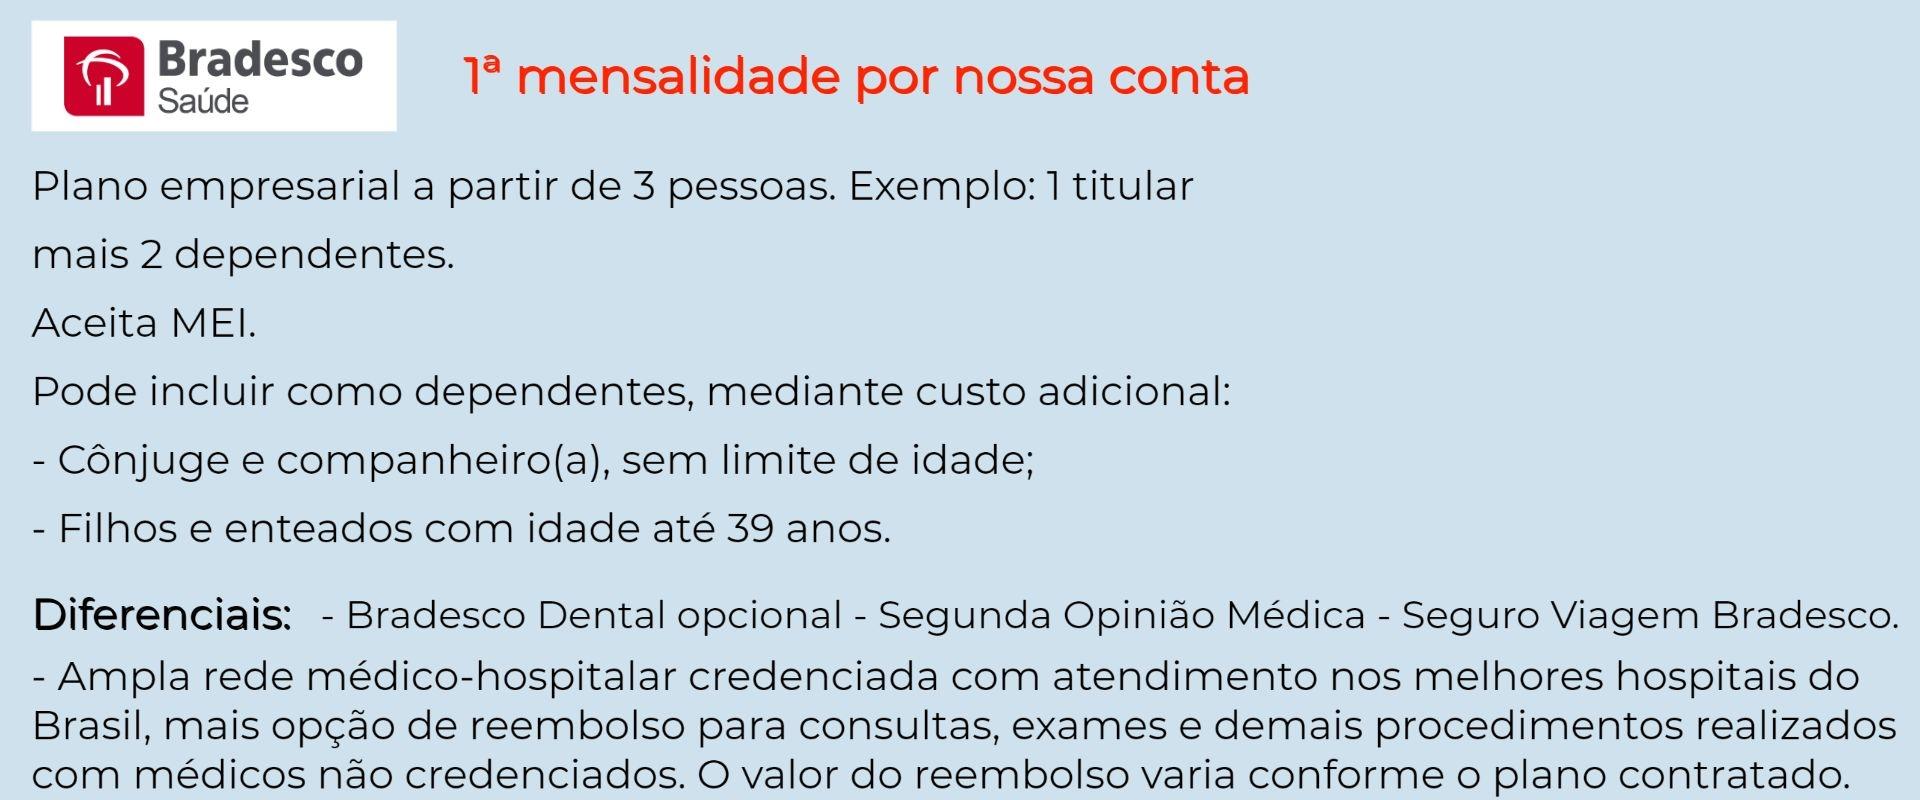 Bradesco Saúde Empresarial - José Bonifácio